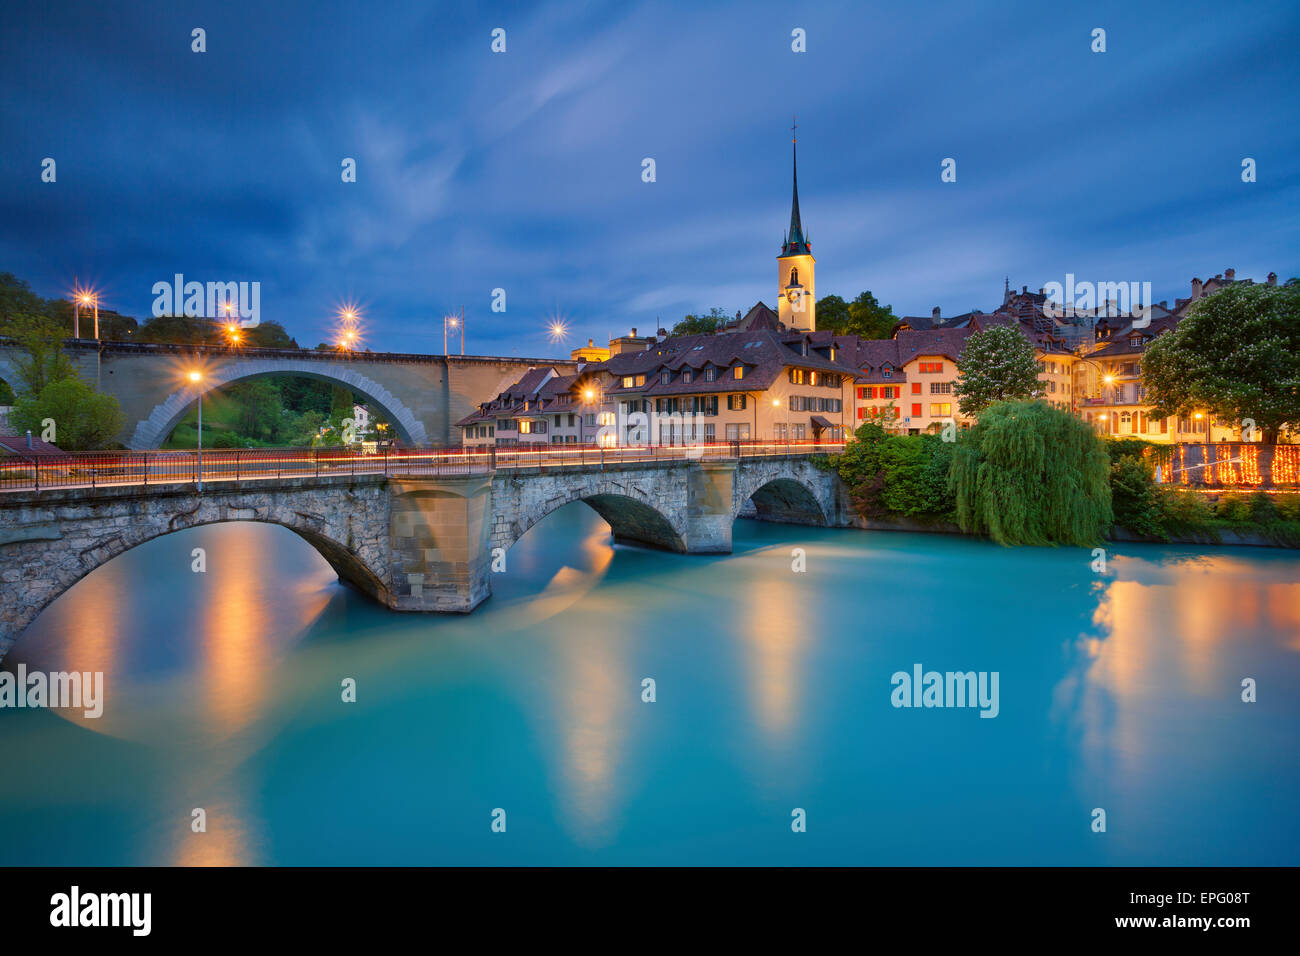 Berna. Imagen de Berna, capital de Suiza, durante la hora azul crepúsculo. Foto de stock